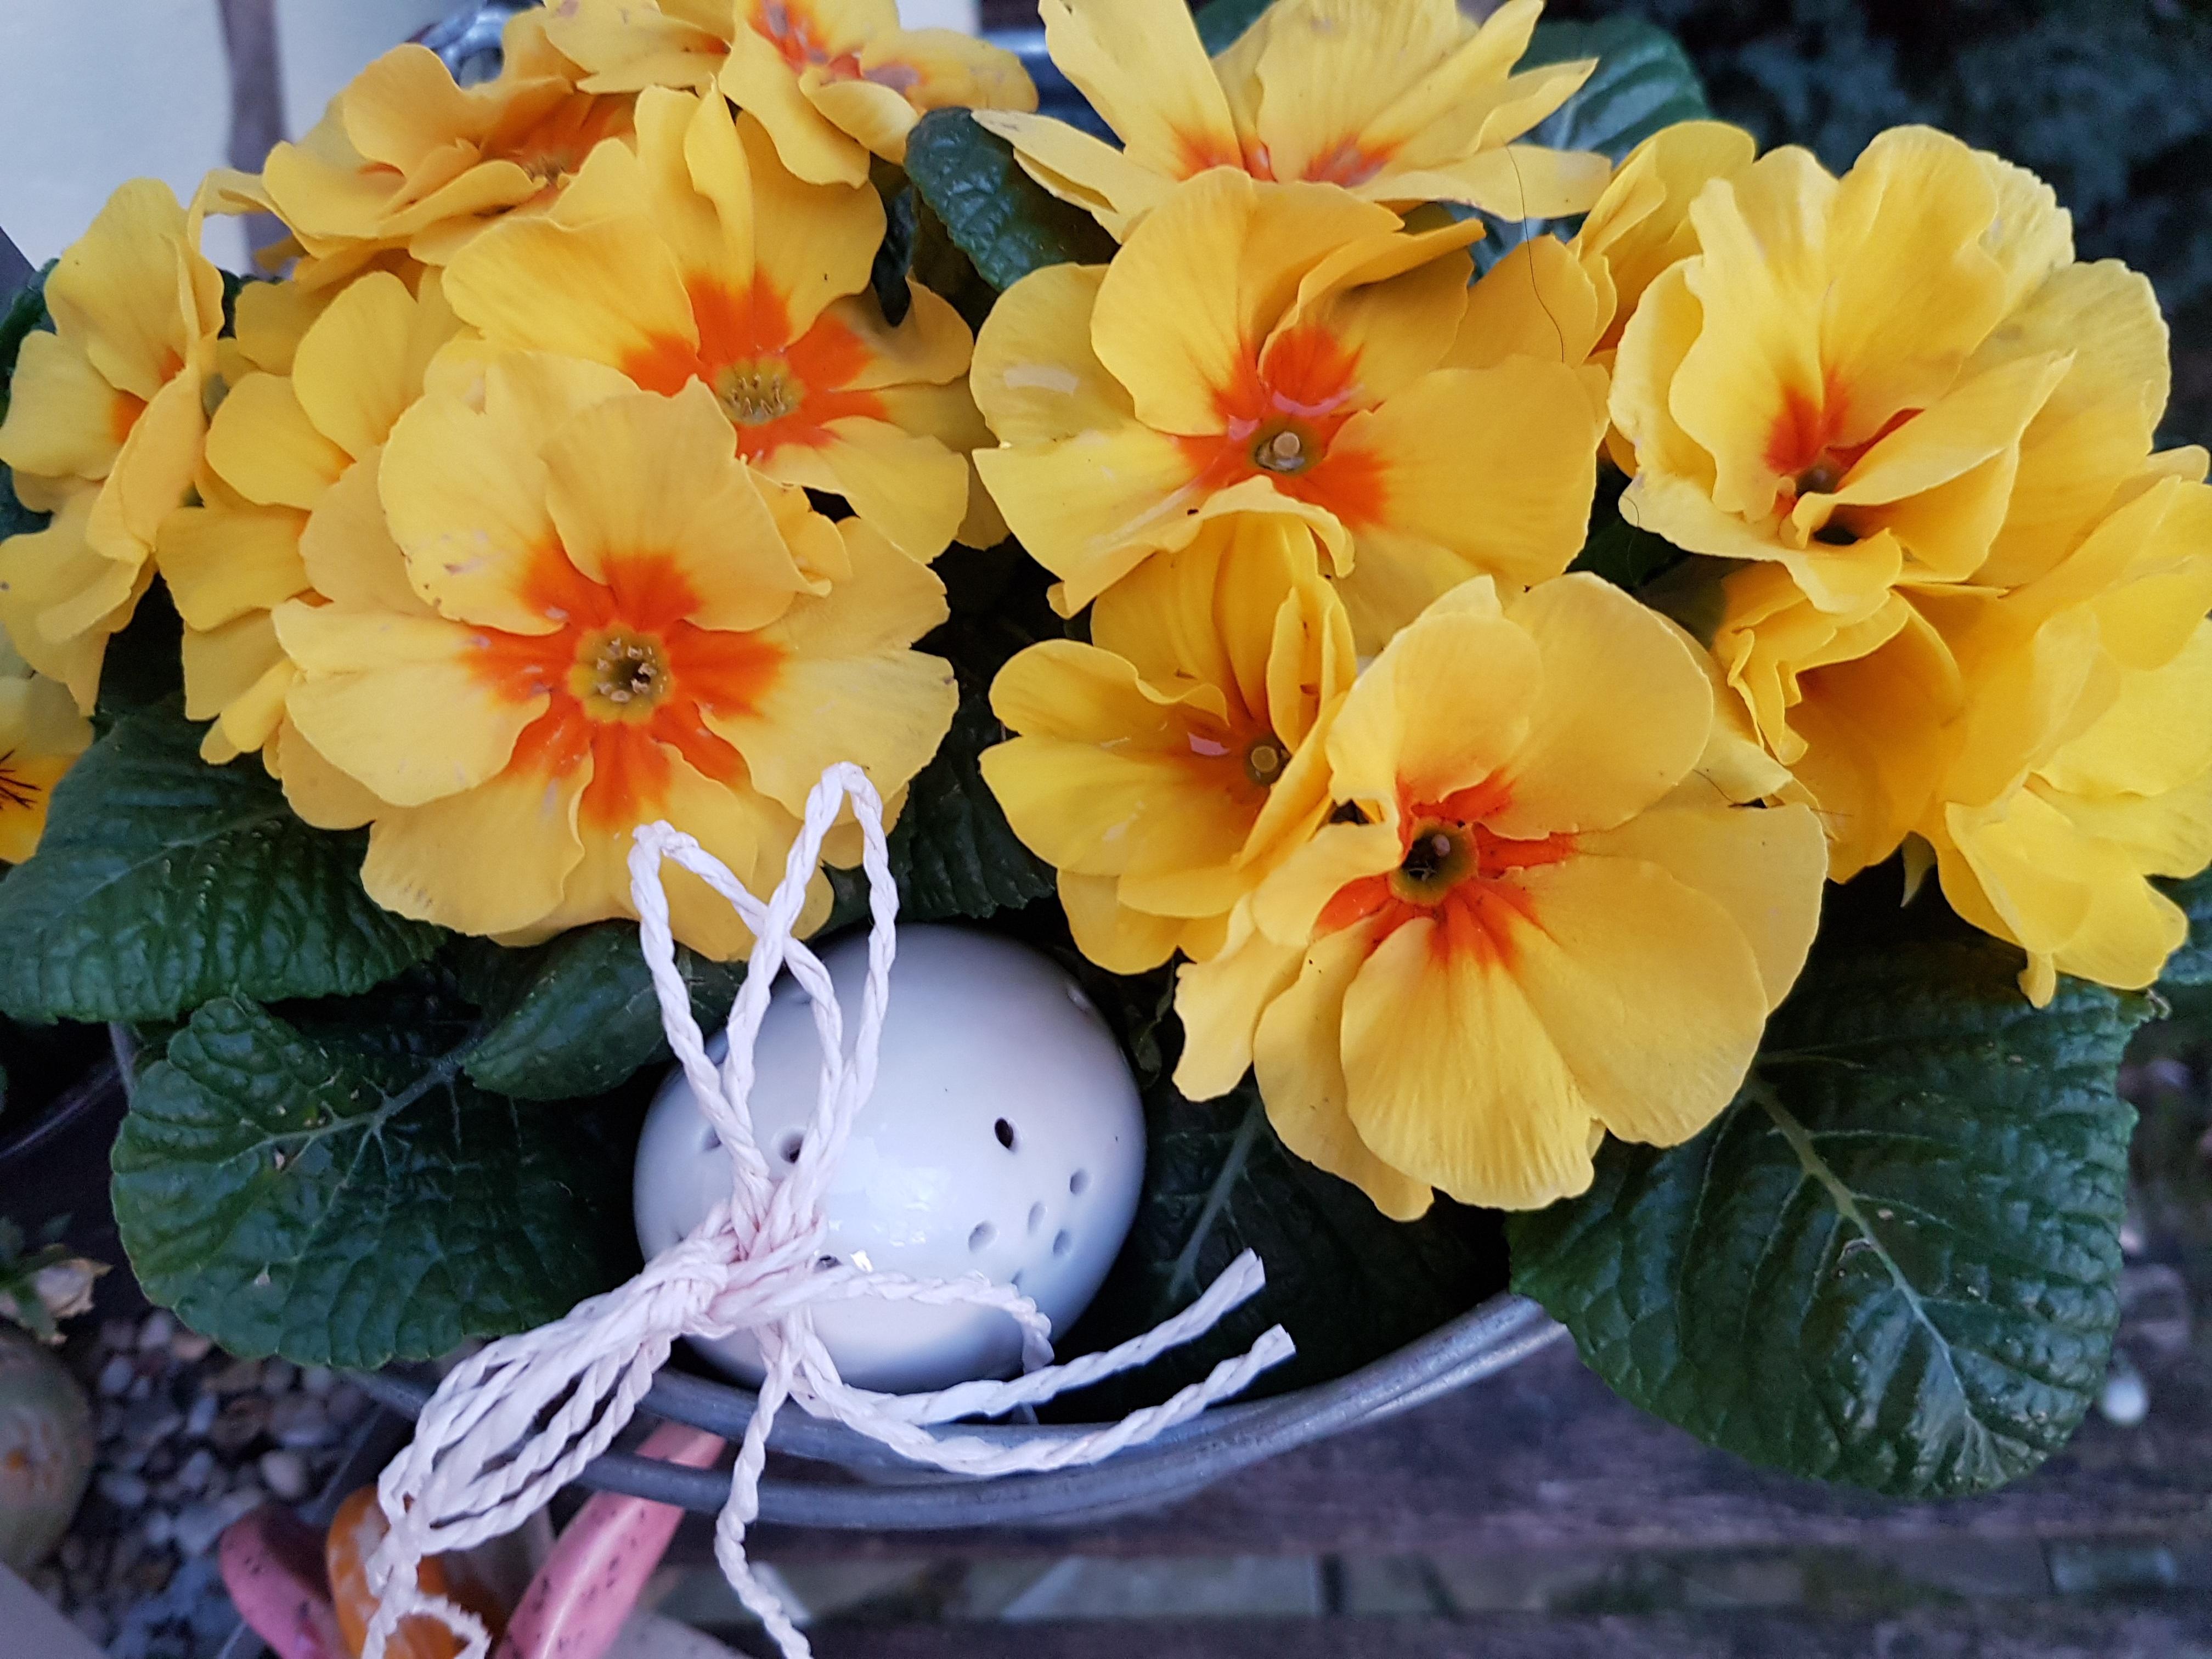 Free Images : nature, petal, botany, close, flora, yellow flower ...